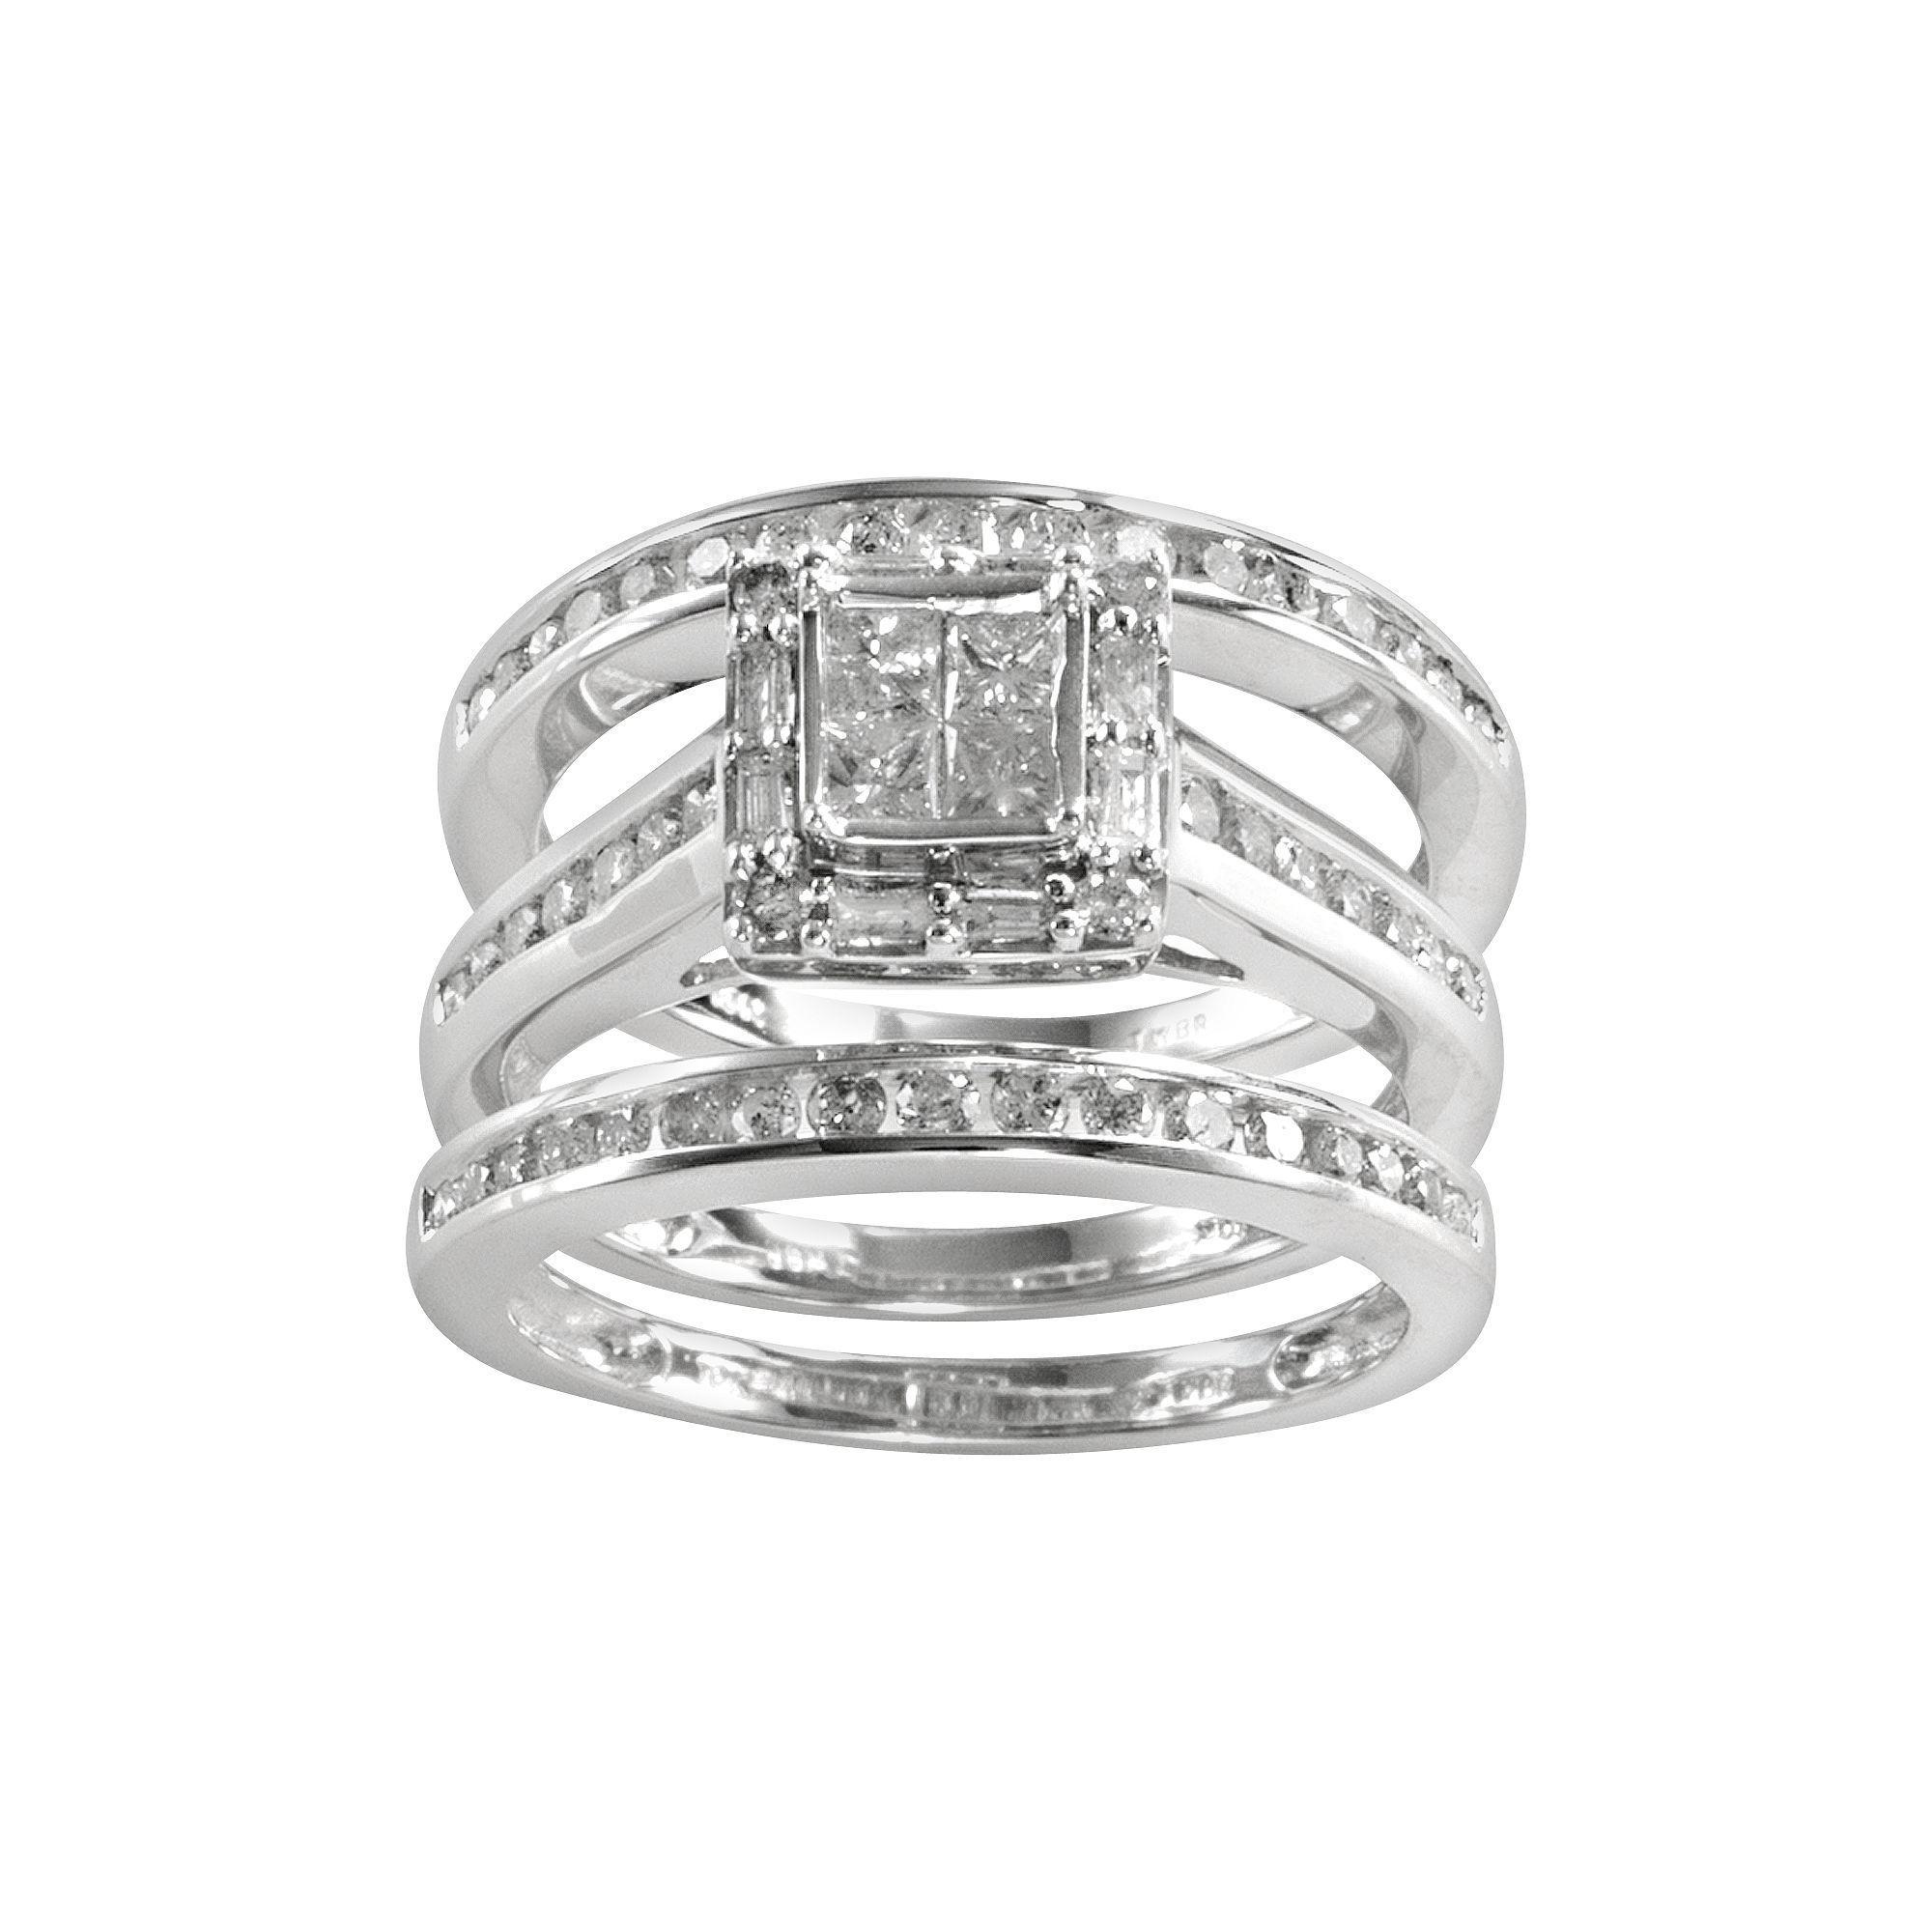 Princesscut diamond square engagement ring set in k white gold